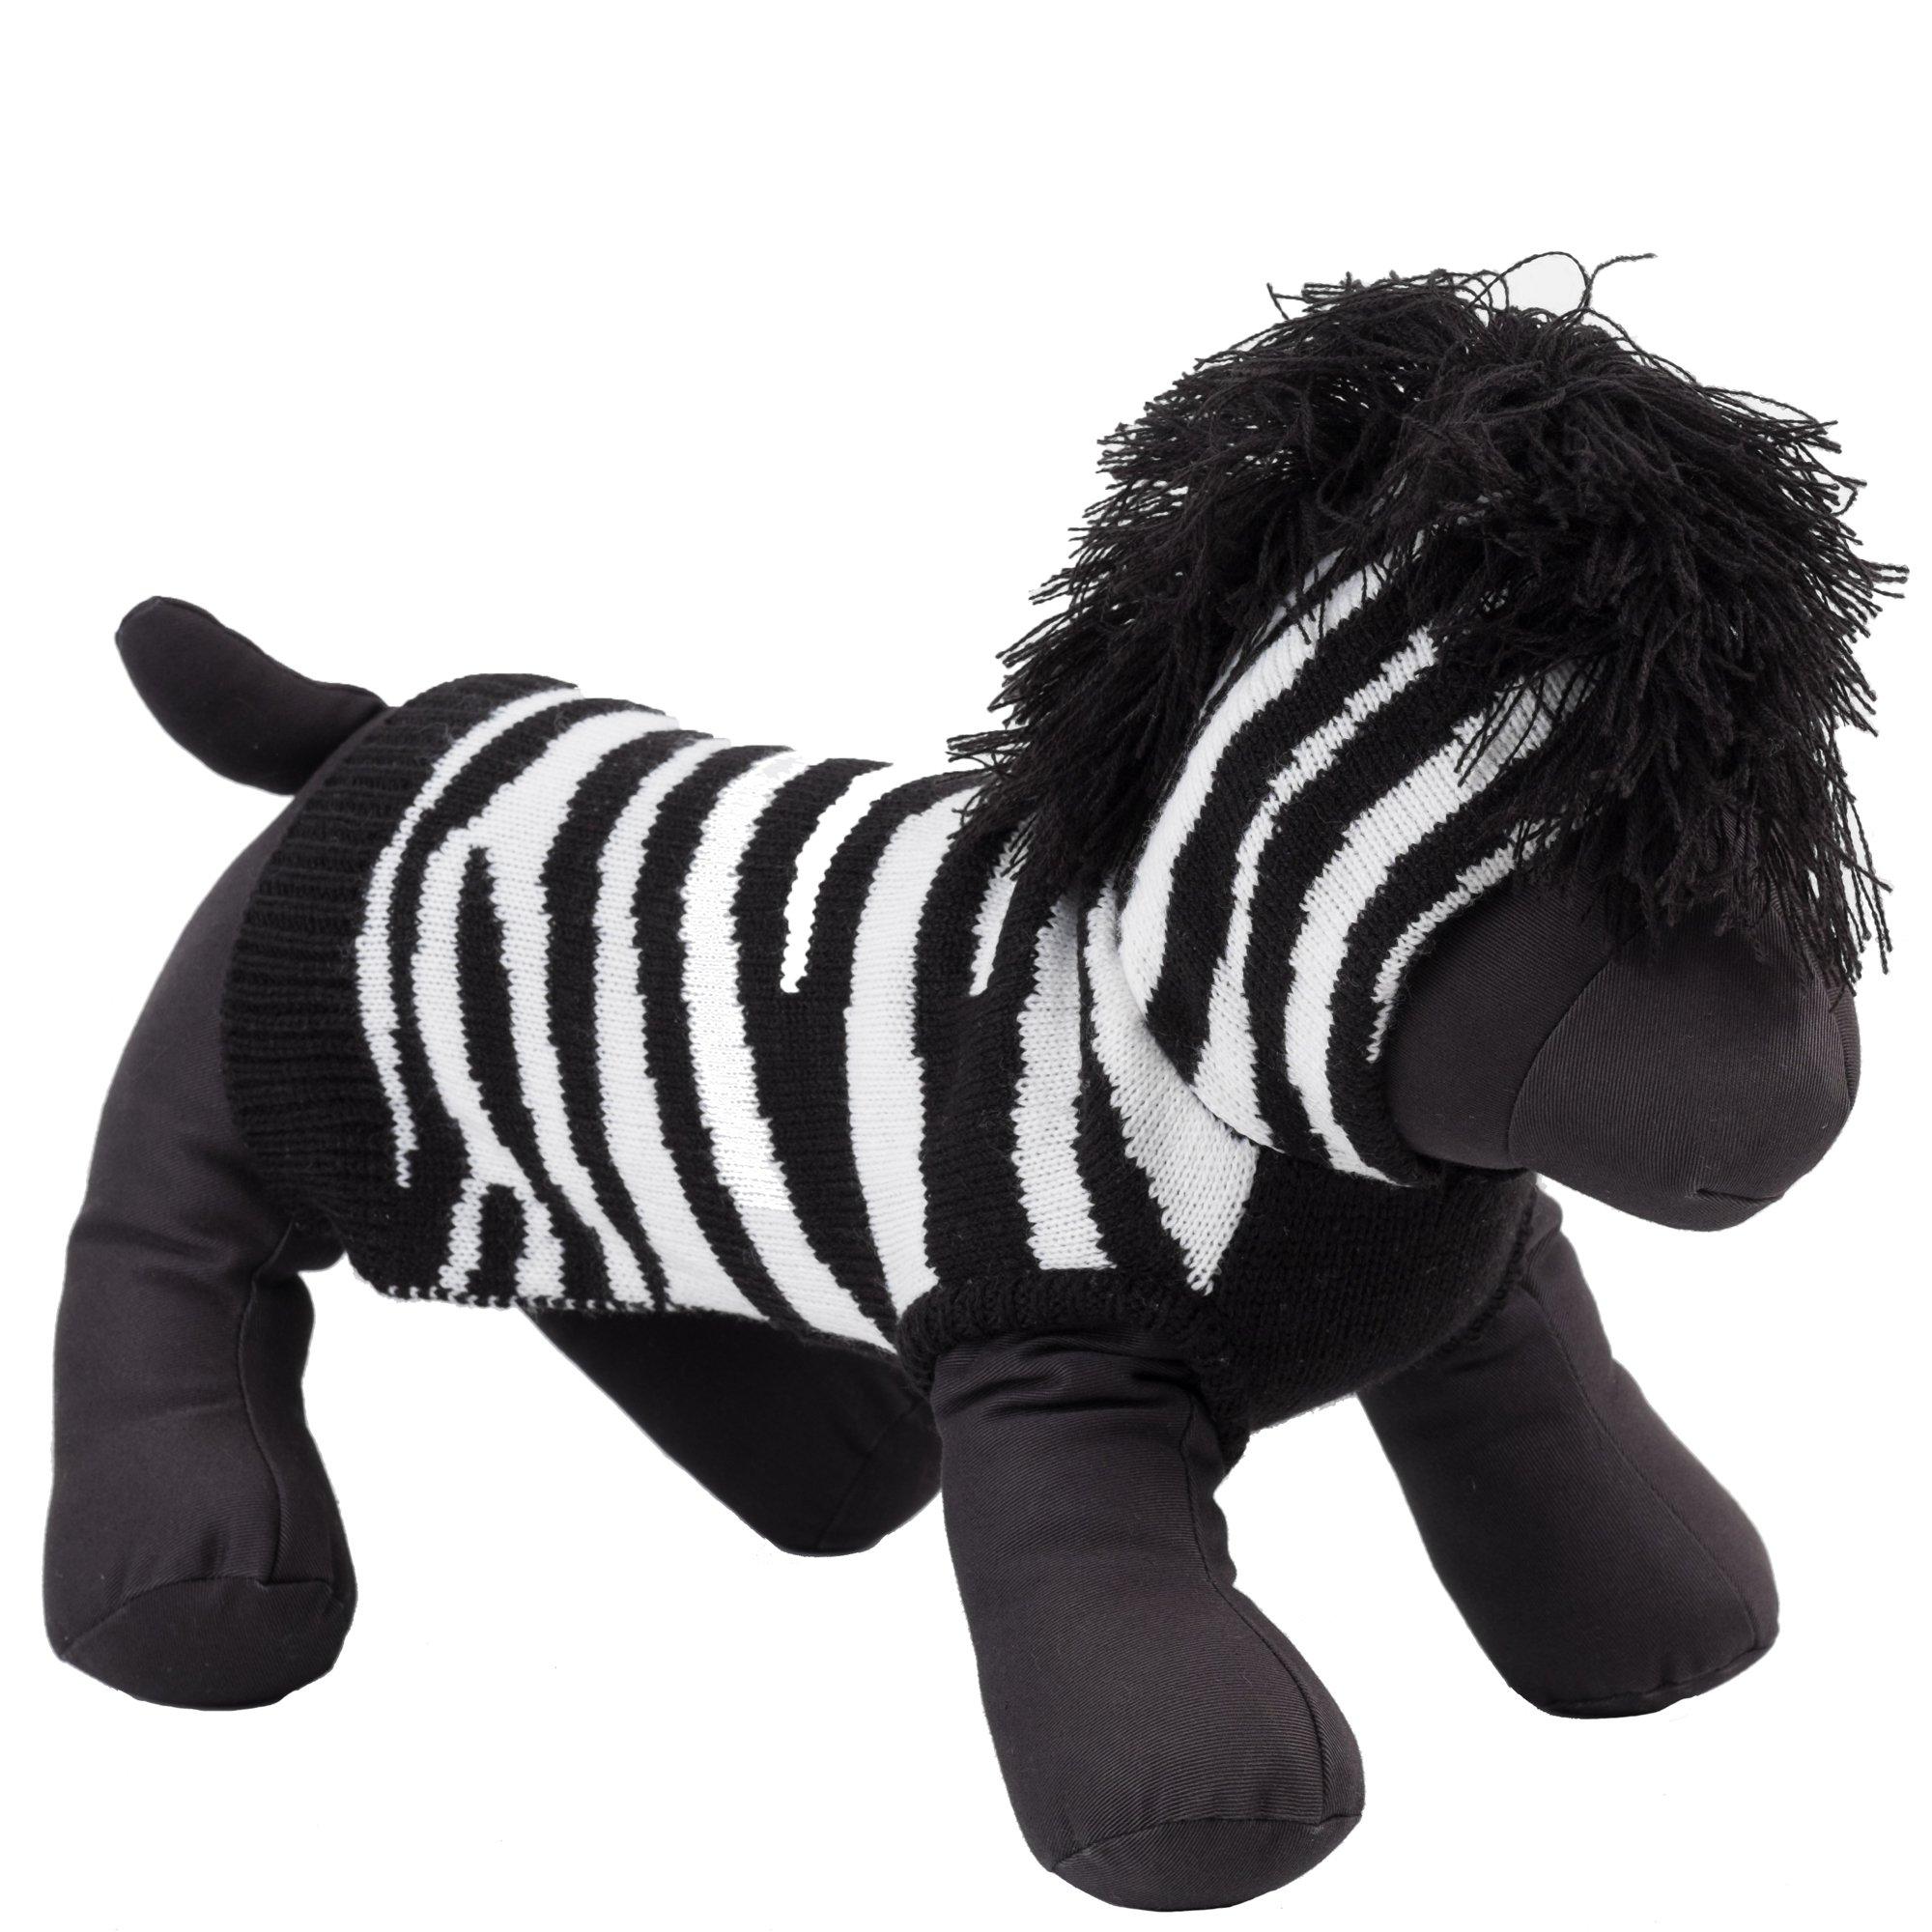 The Worthy Dog 6366 Zebra Hoodie, Black/White, XL by The Worthy Dog